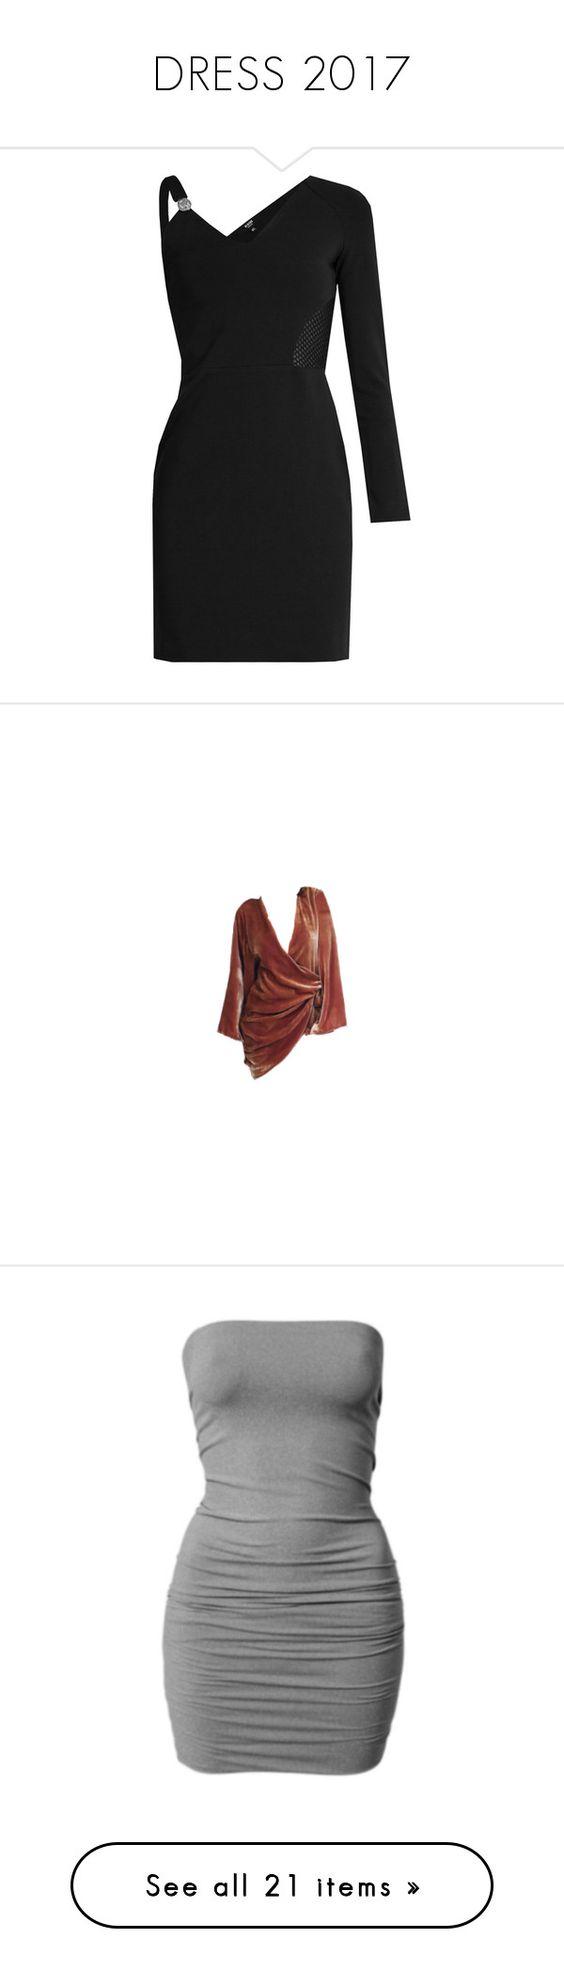 """DRESS 2017"" by neide-goncalvesbrito ❤ liked on Polyvore featuring dresses, black, metallic mini dress, long-sleeve mini dress, asymmetrical dresses, sporty dresses, sleeved dresses, delete, men's fashion and vestidos"